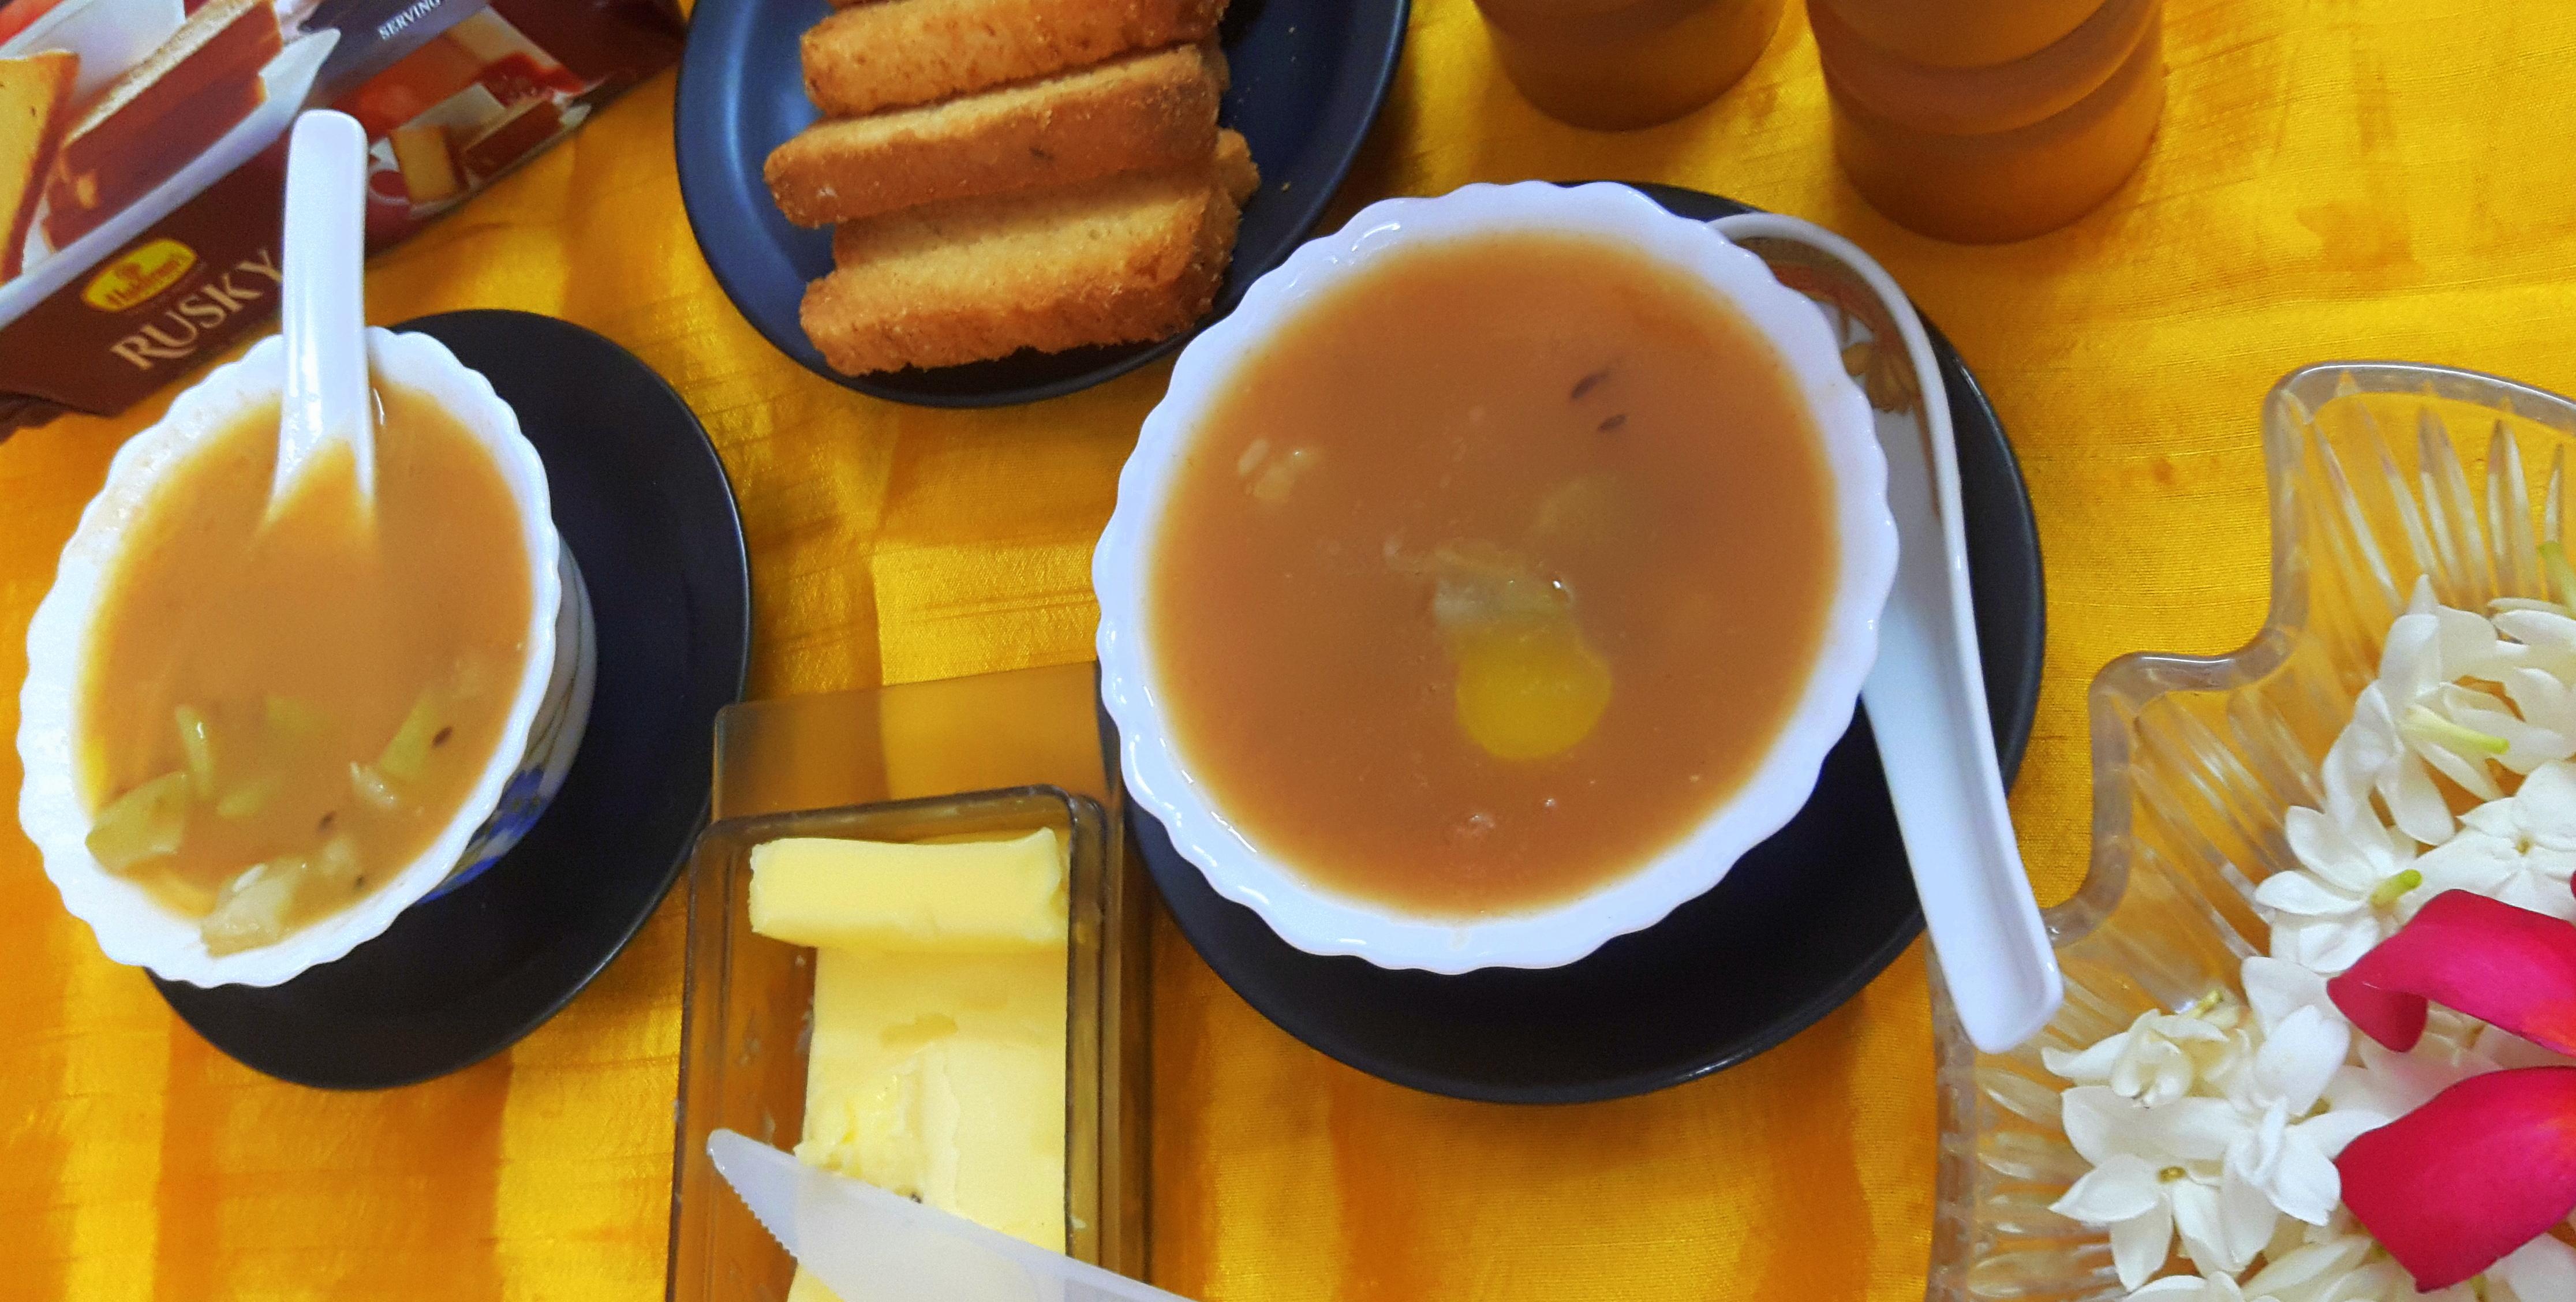 Lauki (bottle gourd) soup